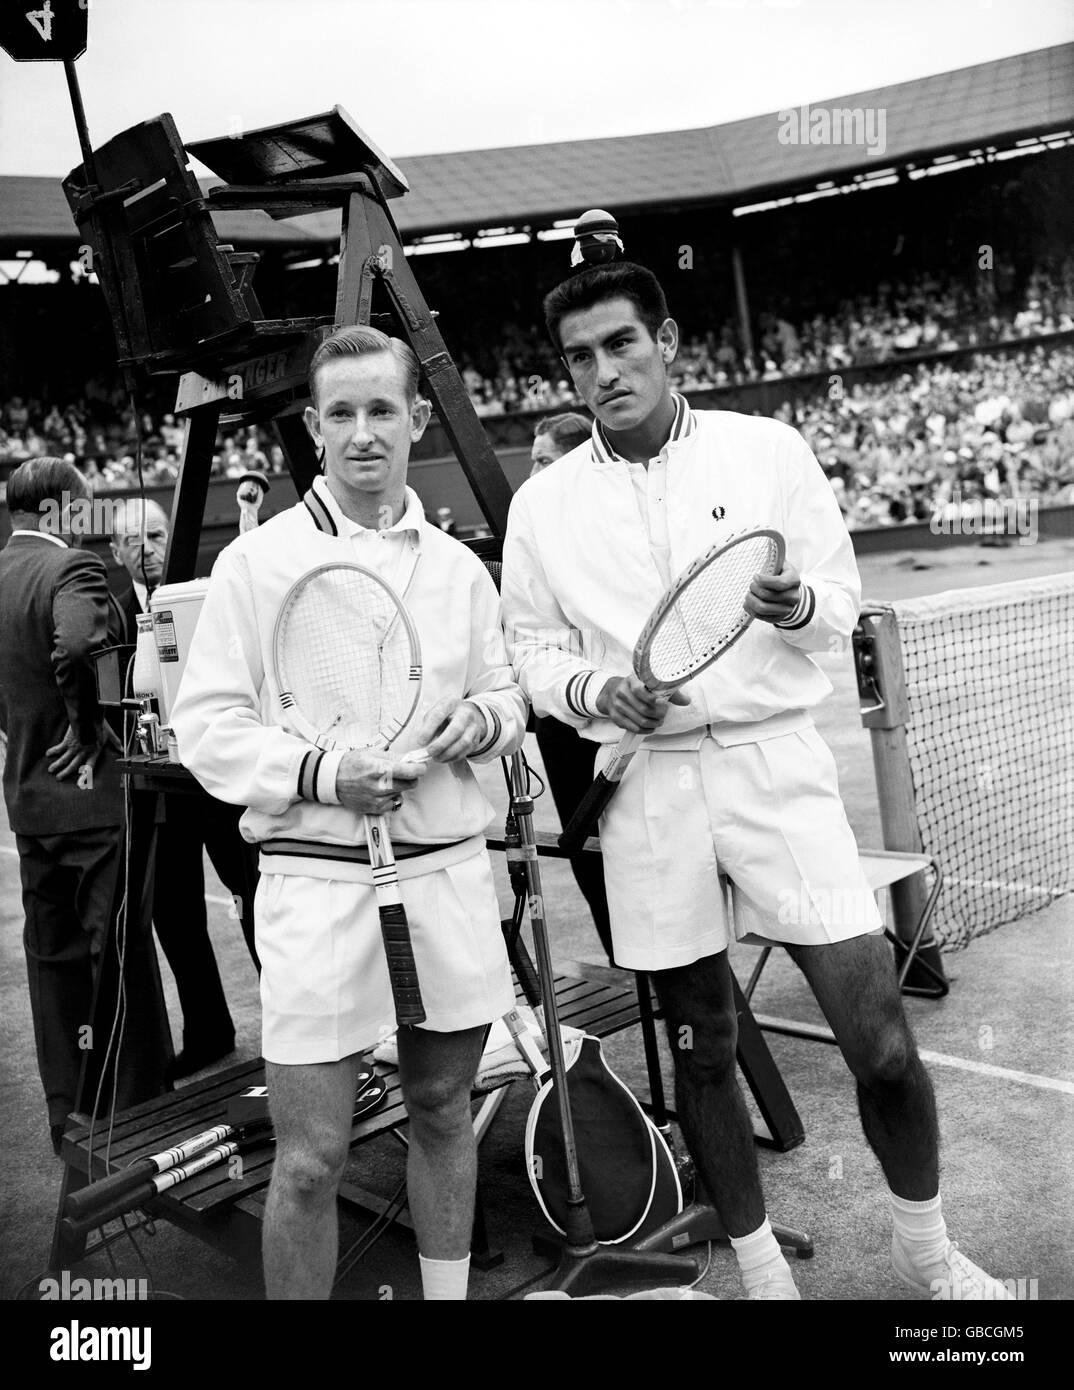 Tennis - Wimbledon Championships - Men's Singles - Final - Alex Olmedo v Rod Laver - Stock Image